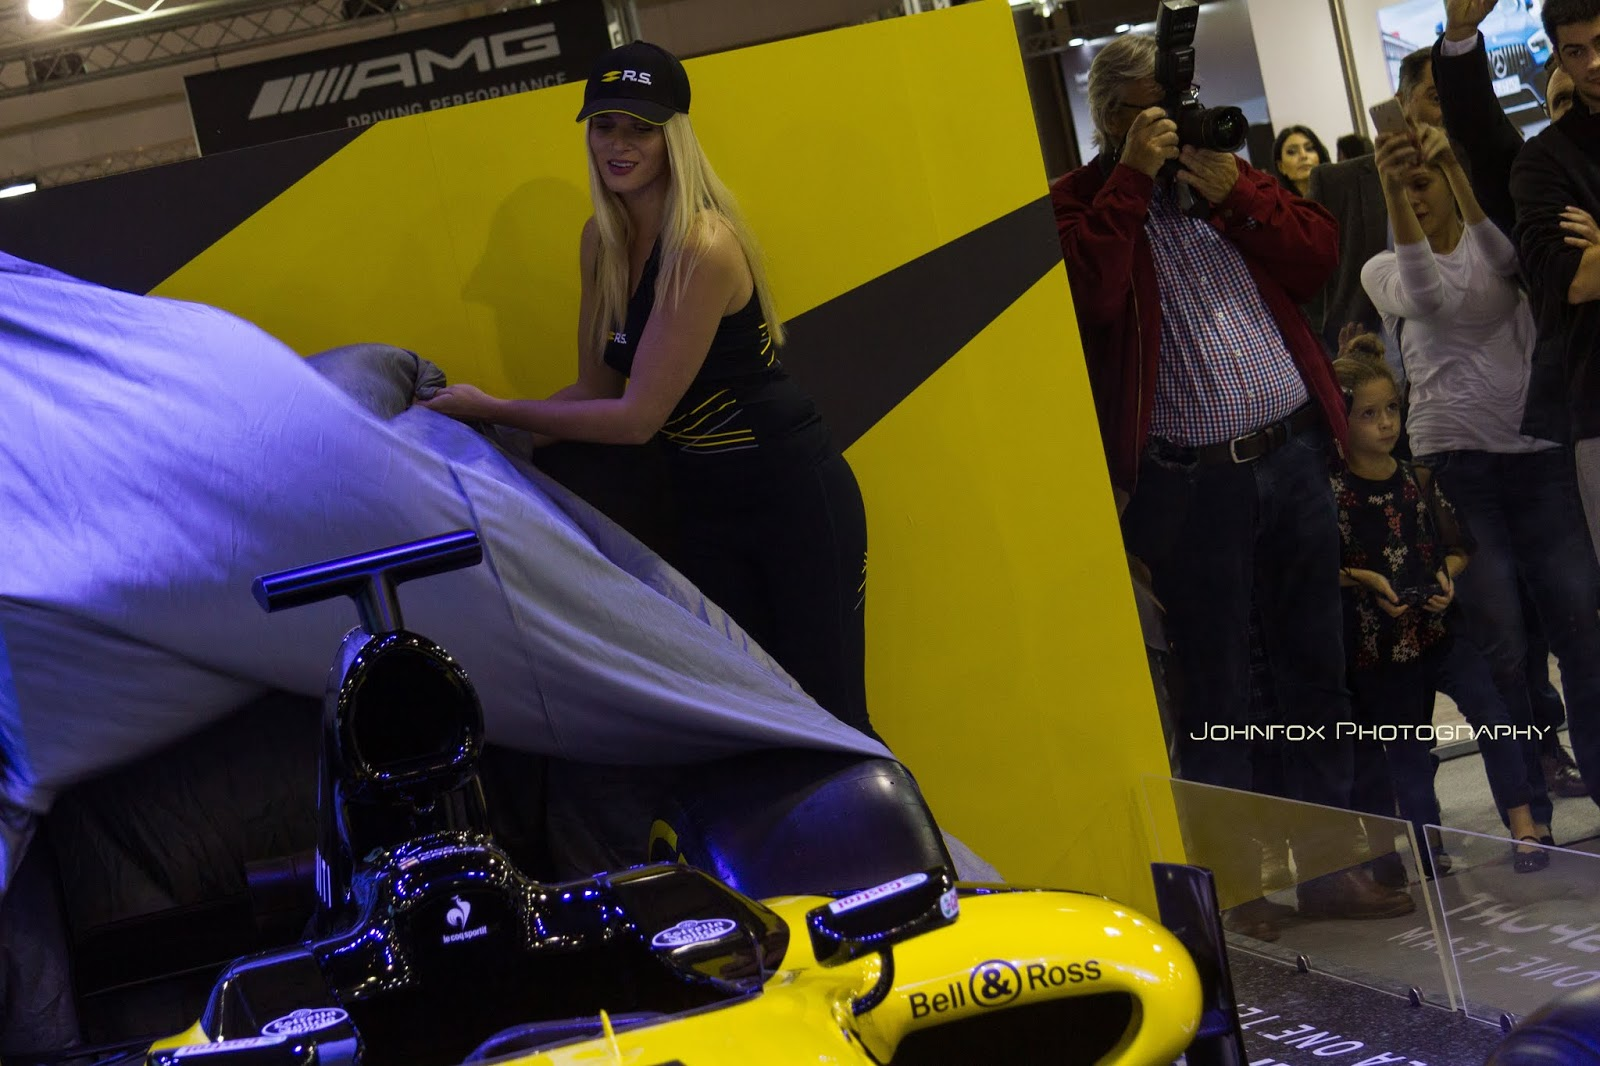 models2B2528112Bof2B232529 Τα κορίτσια της Αυτοκίνησης! Έκθεση, μοντέλα, ΦΩΤΟ, φωτογραφίες